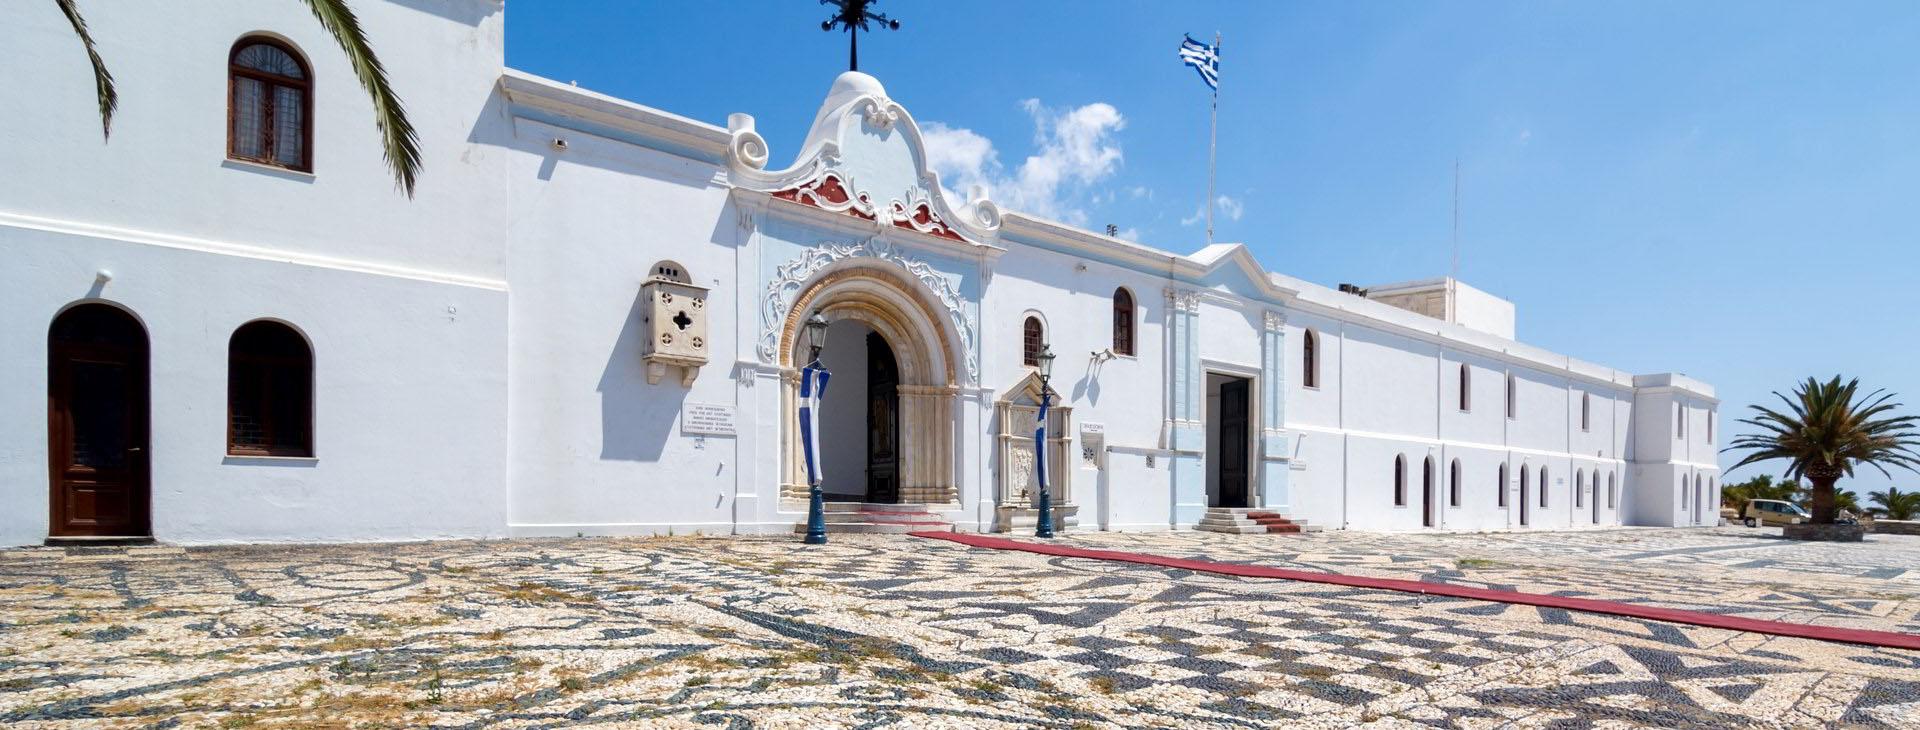 The church of Virgin Mary, Tinos island